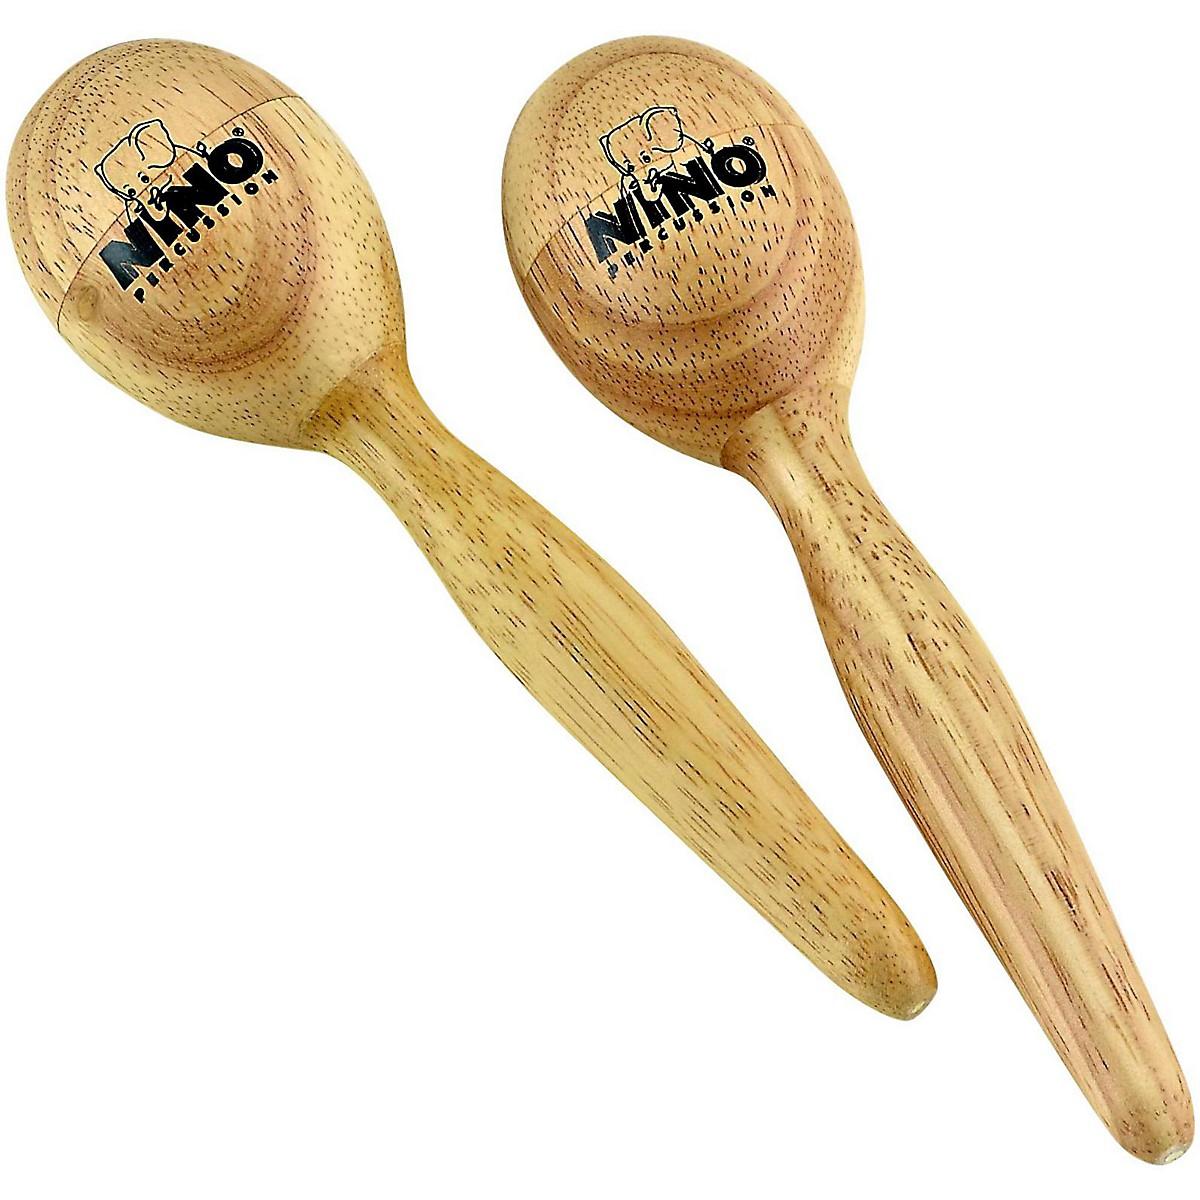 Nino Wood Egg Maracas/Pair